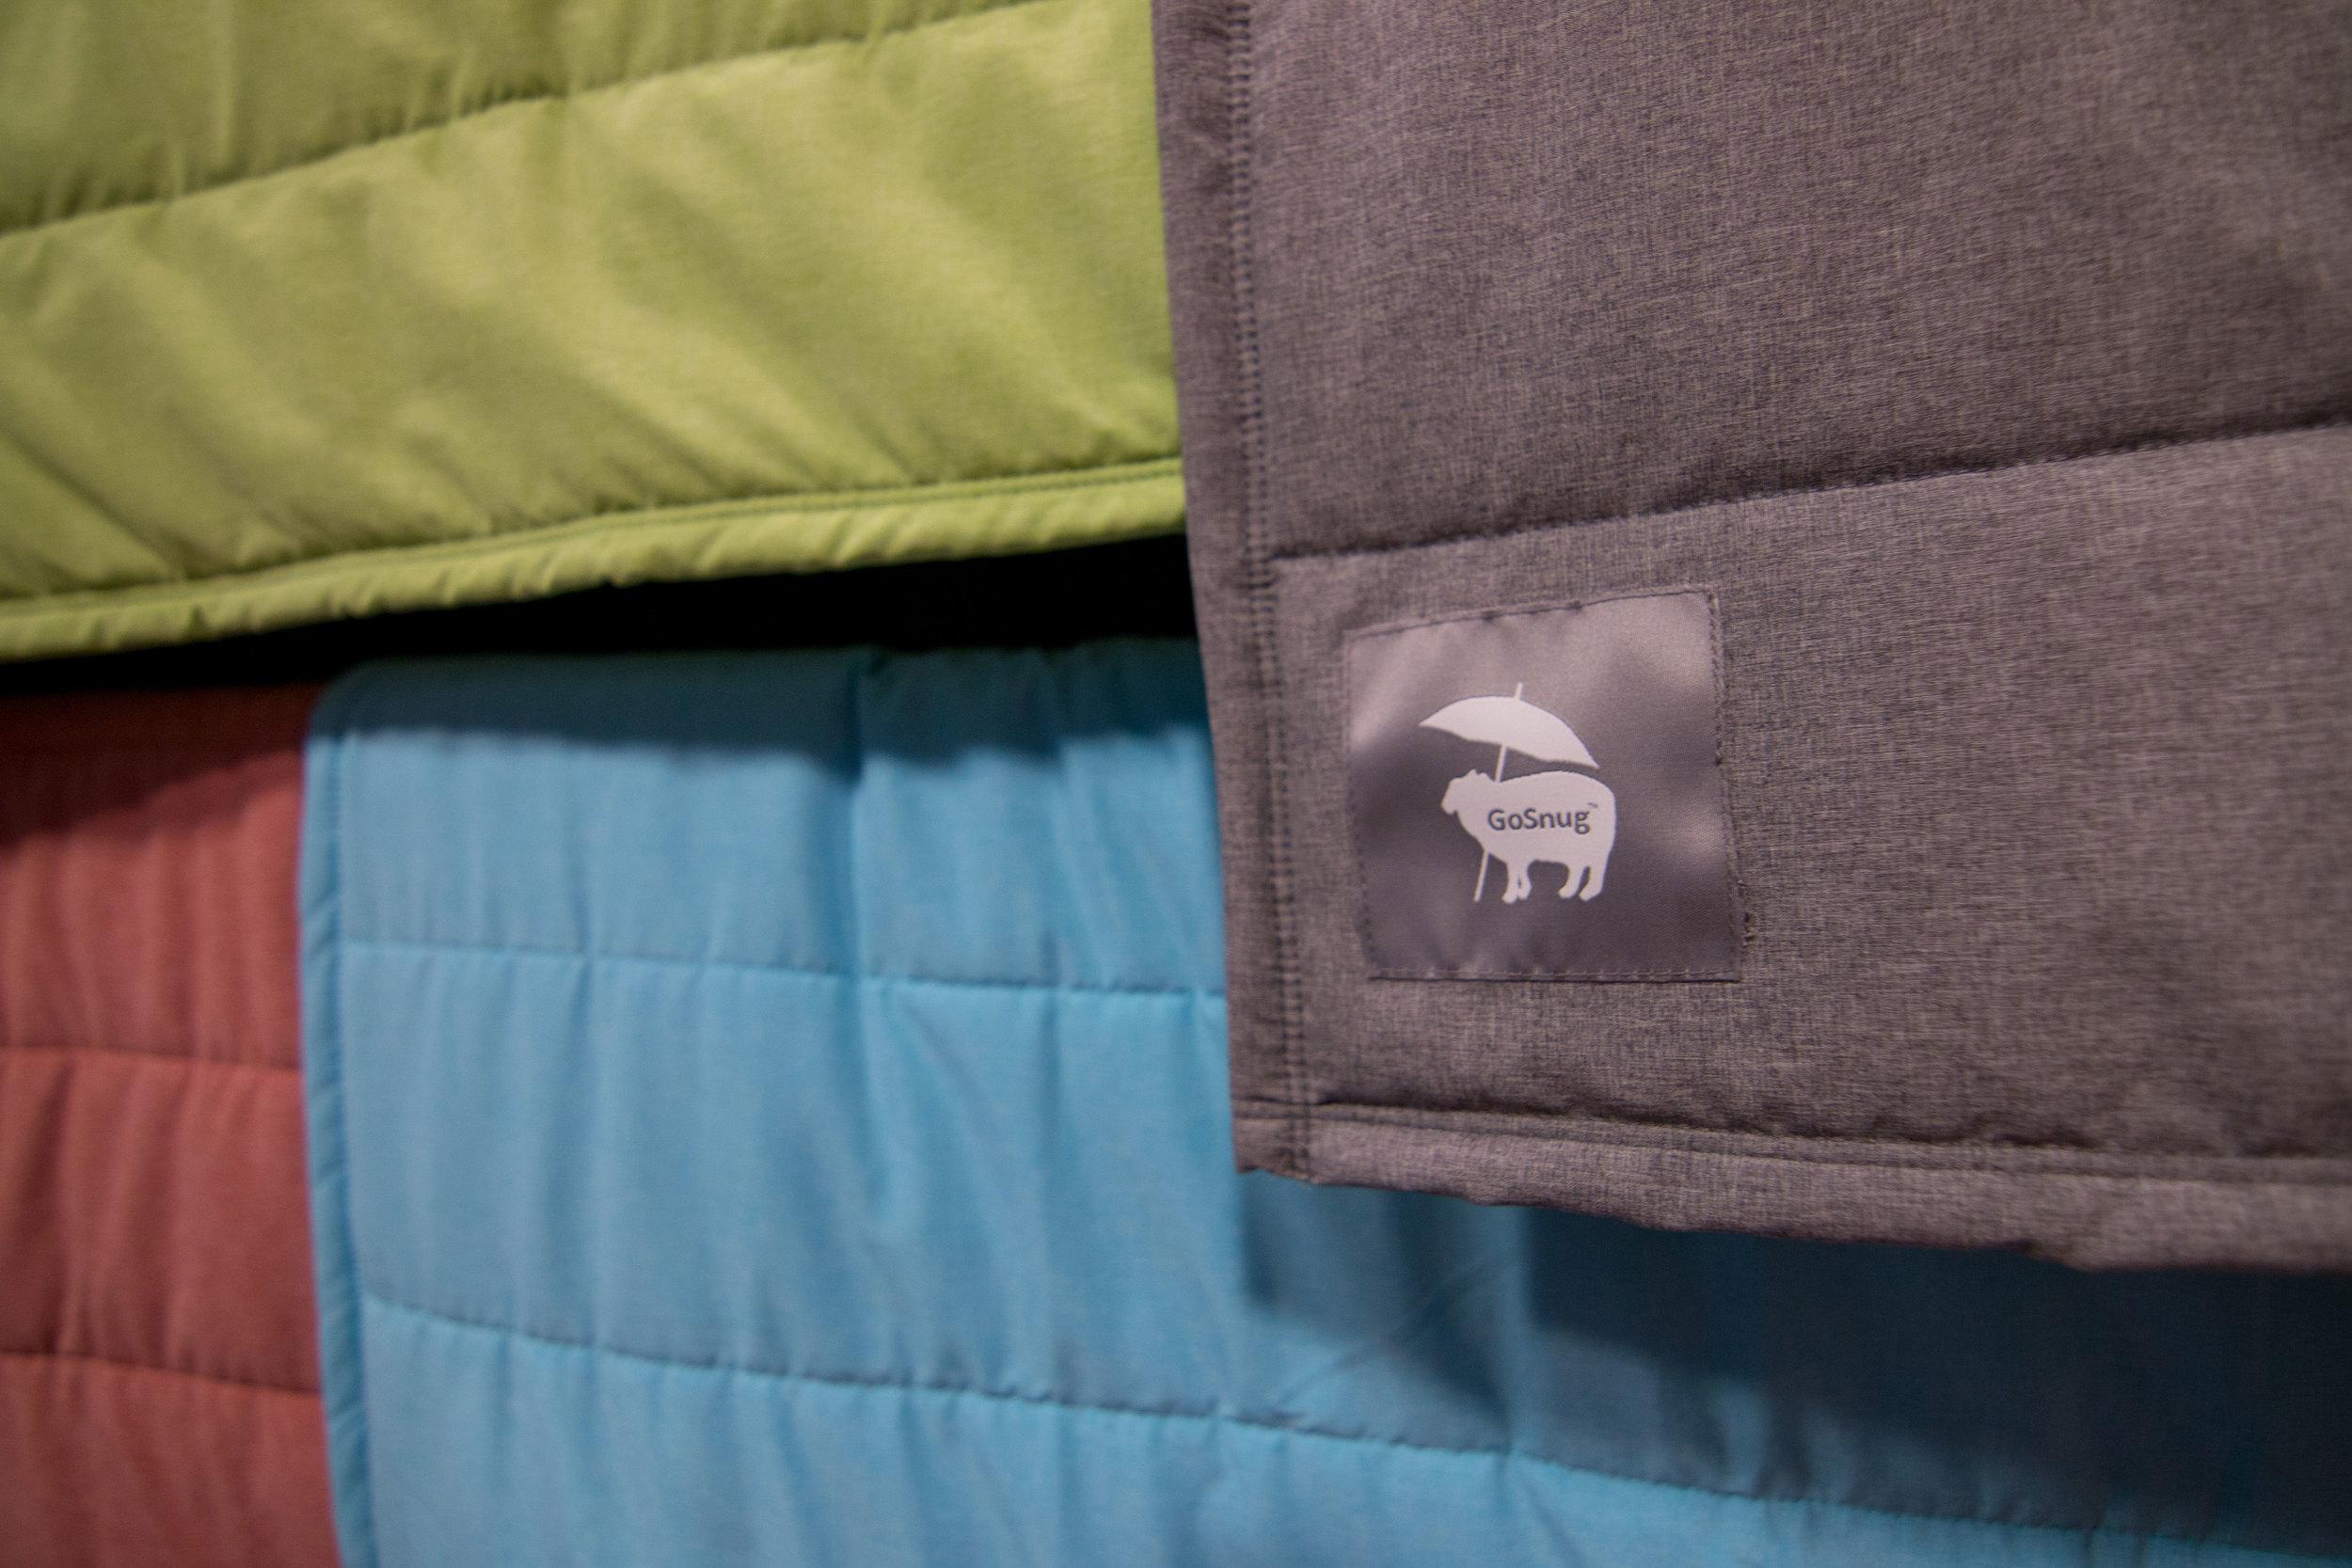 Patrick-Portfolio-GoSnug-Merino-Wool-Blankets-CloseUp.jpg